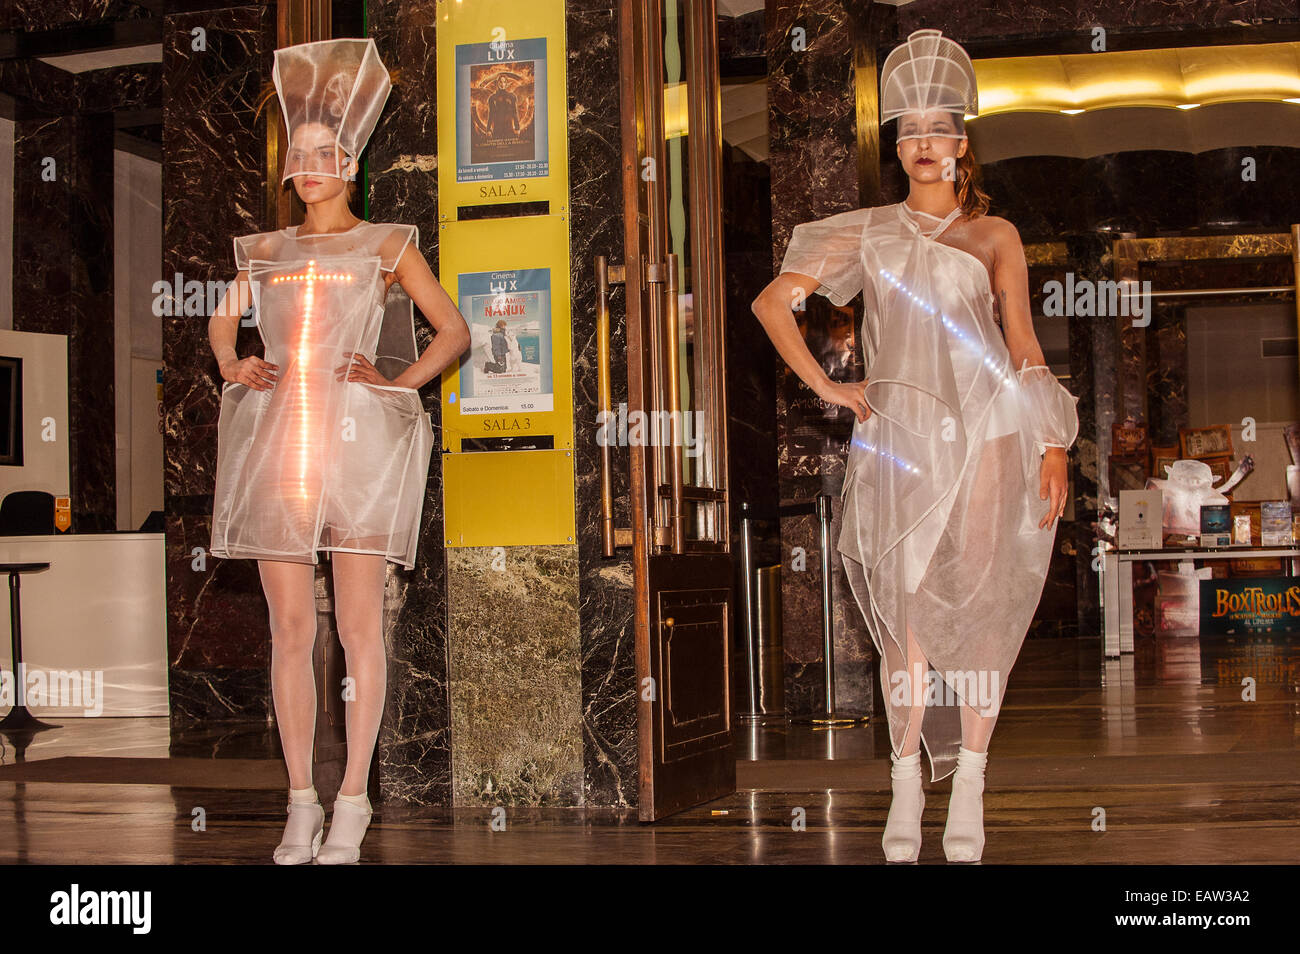 Turín Italia 20 De Noviembre De 2014 Inauguración De